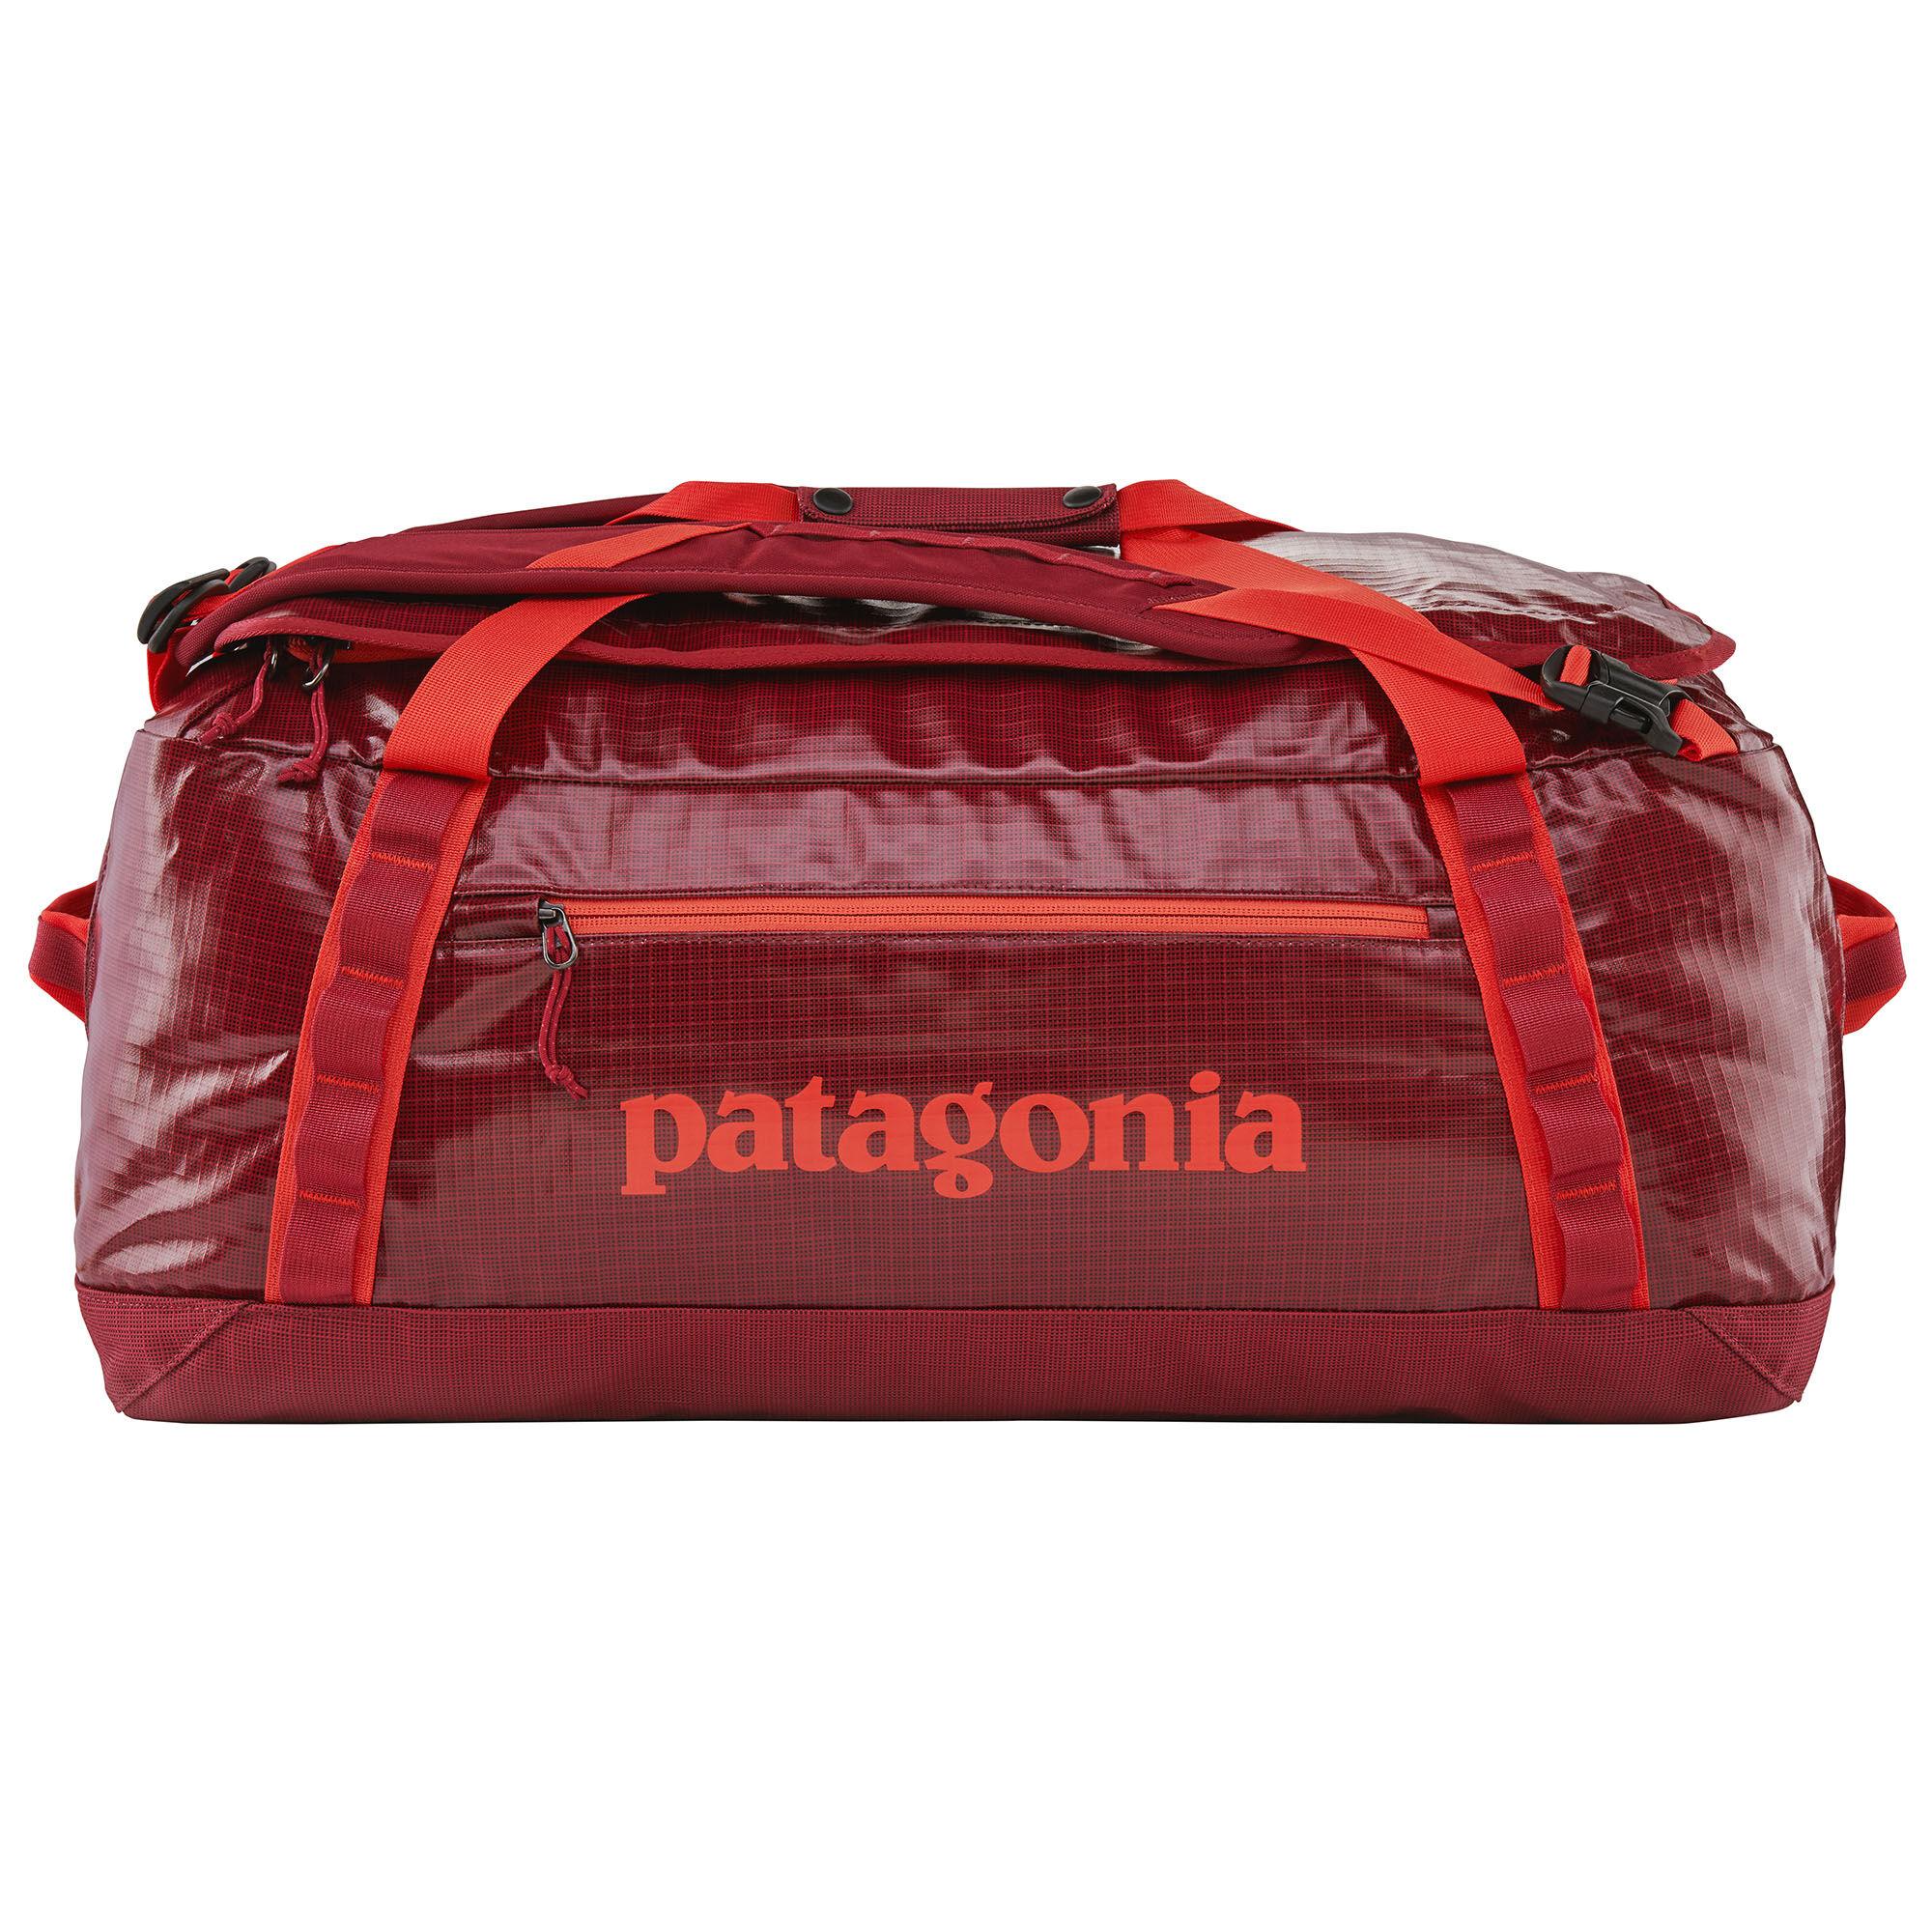 Patagonia Black Hole 55L Duffel Bag  - Home Planet/Piton Purple - Size: One Size